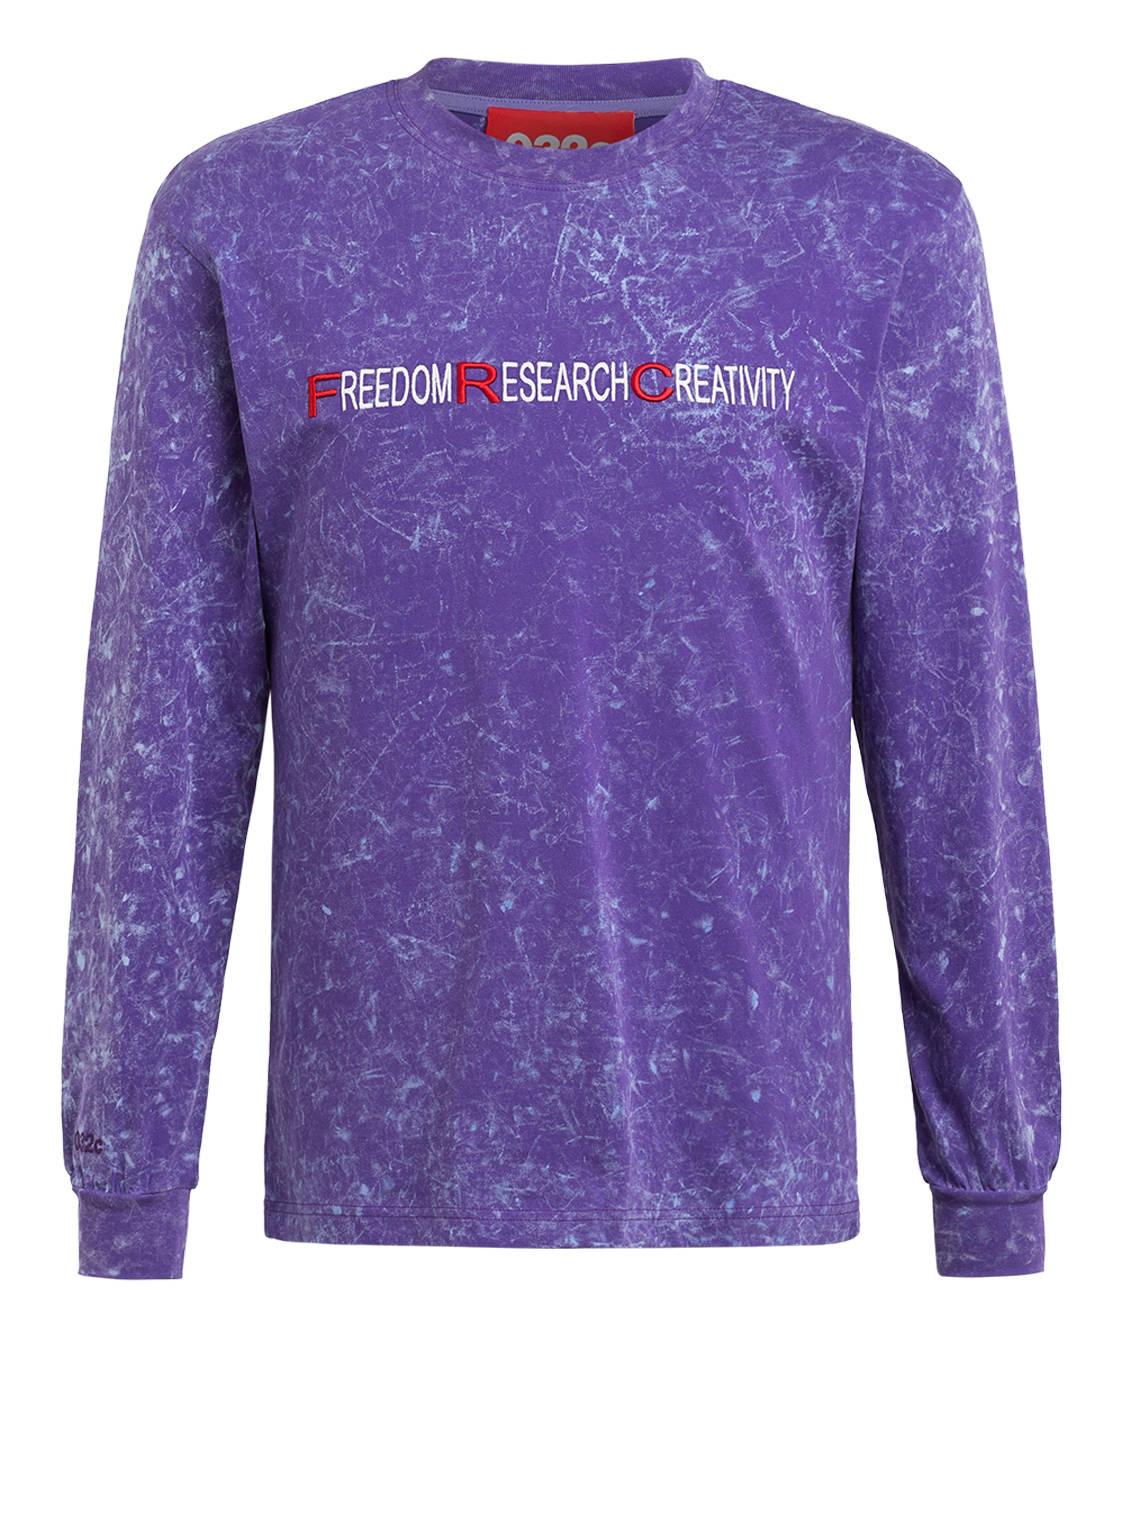 Image of 032c Longsleeve violett